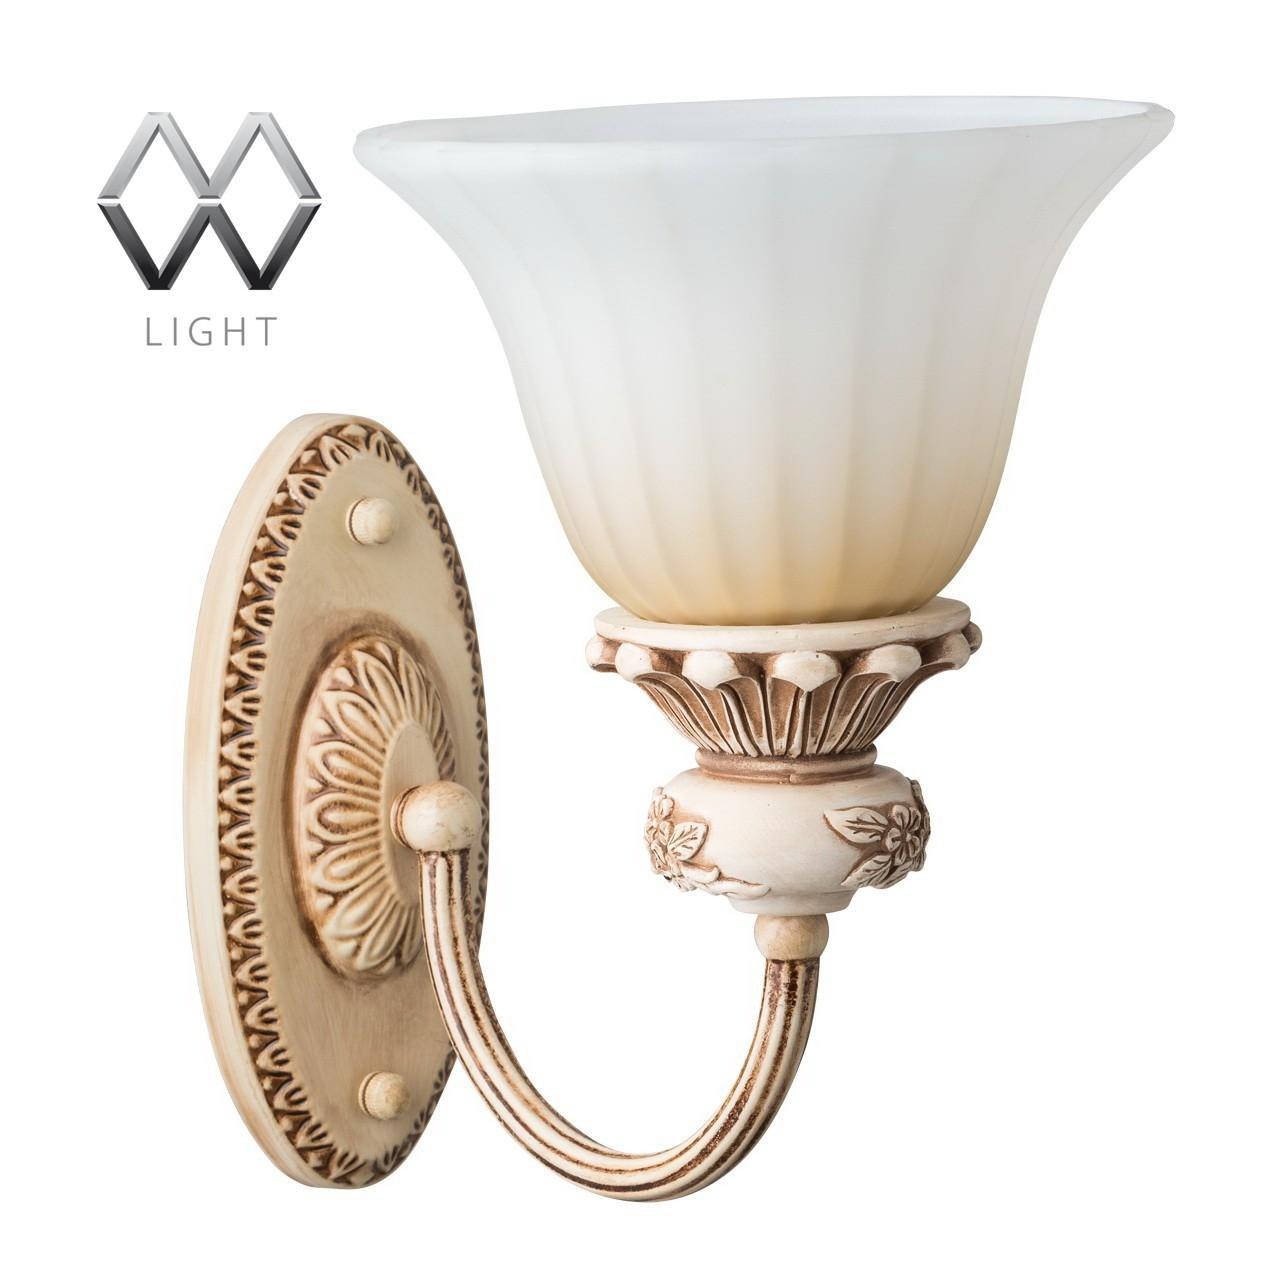 Бра MW-Light Версаче 639021001 mw light бра mw light версаче 639021701